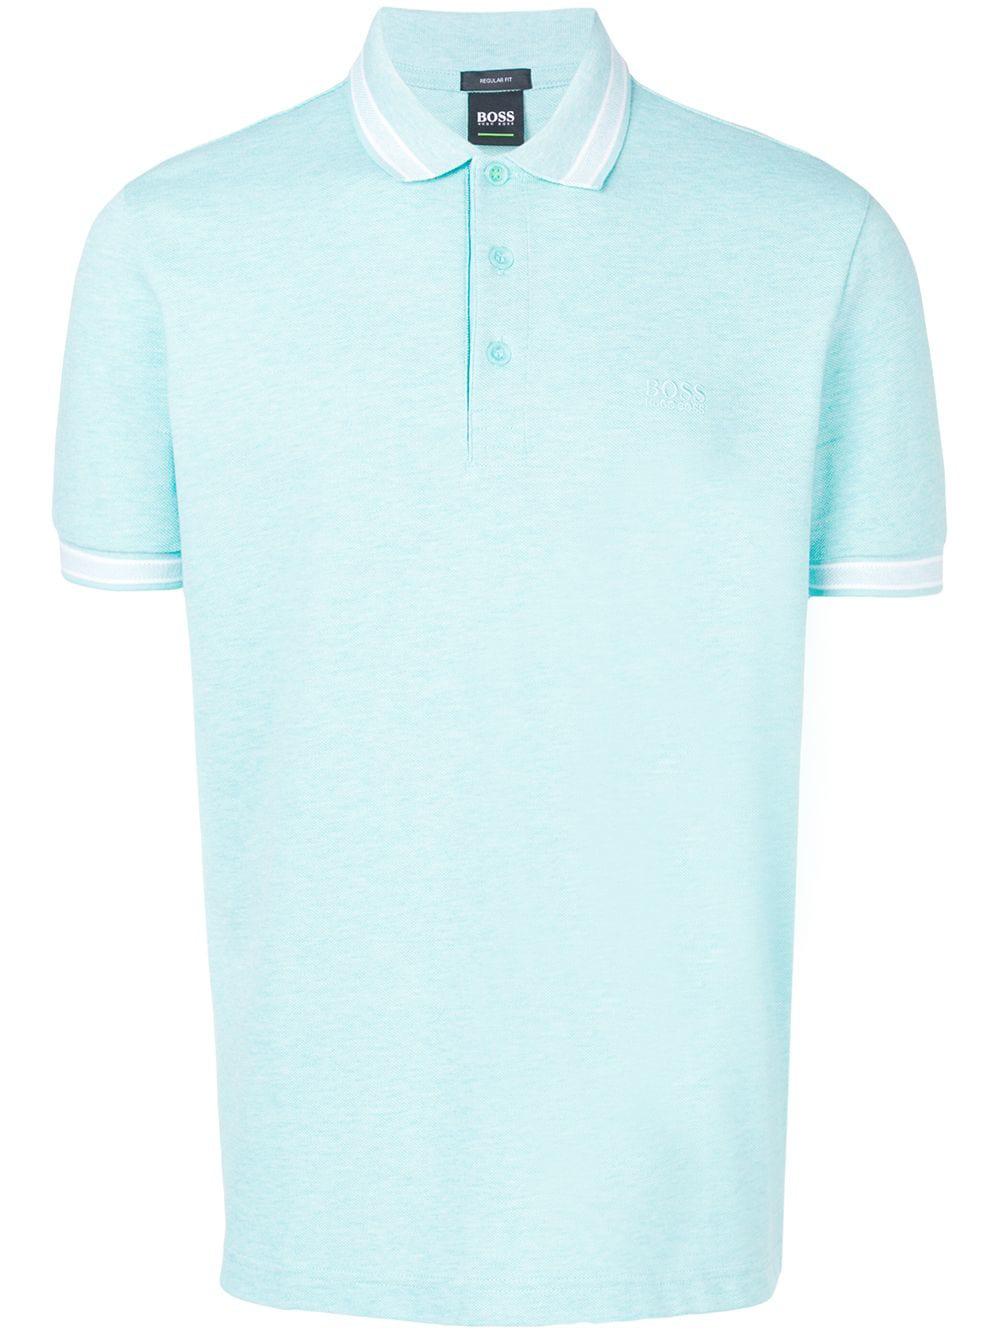 c8ec02926 Boss Hugo Boss Embroidered Logo Polo Shirt - Blue